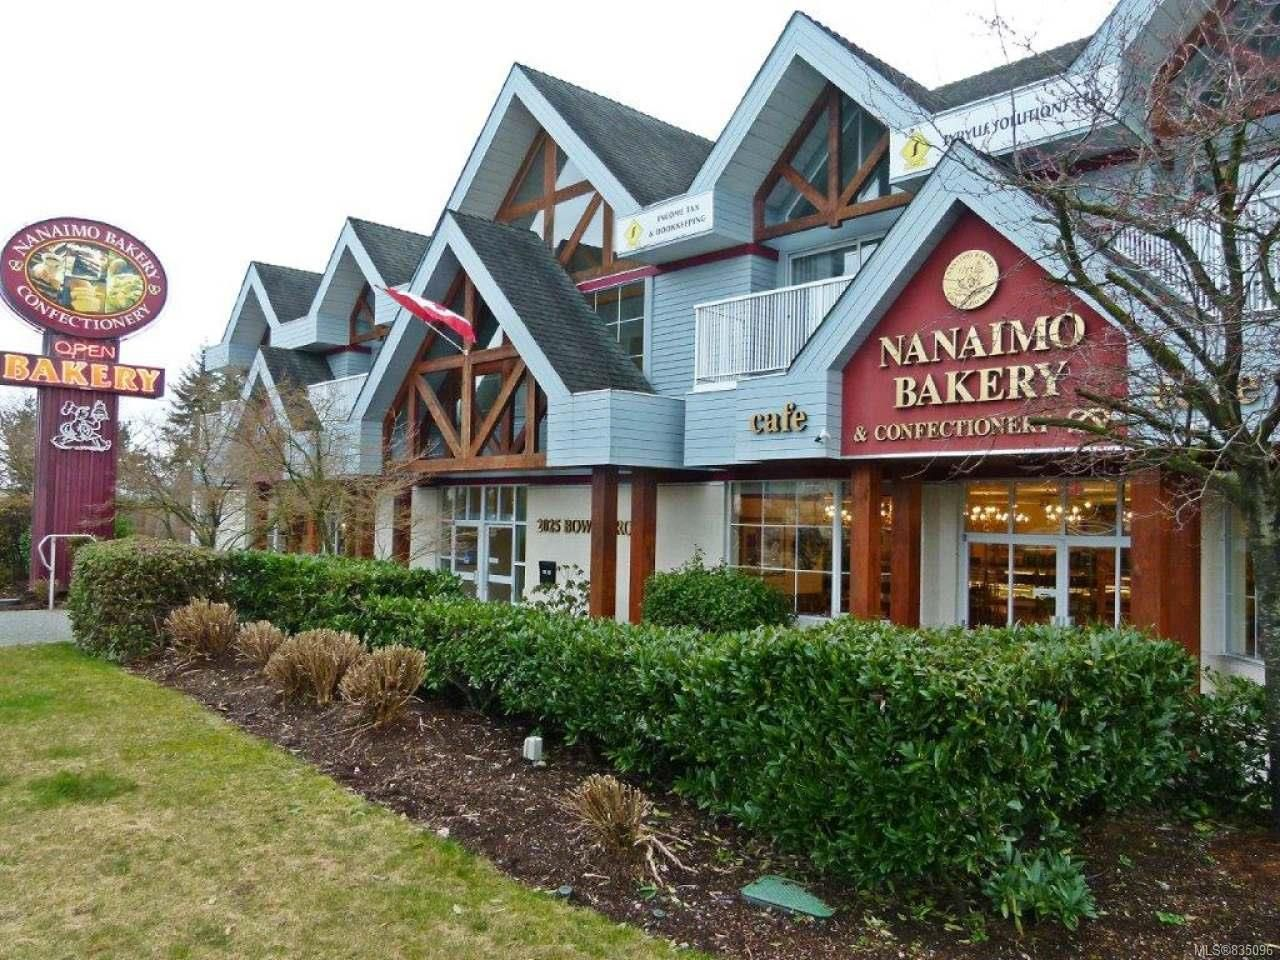 Photo 2: Photos: 2025 Bowen Rd in NANAIMO: Na Central Nanaimo Mixed Use for sale (Nanaimo)  : MLS®# 835096